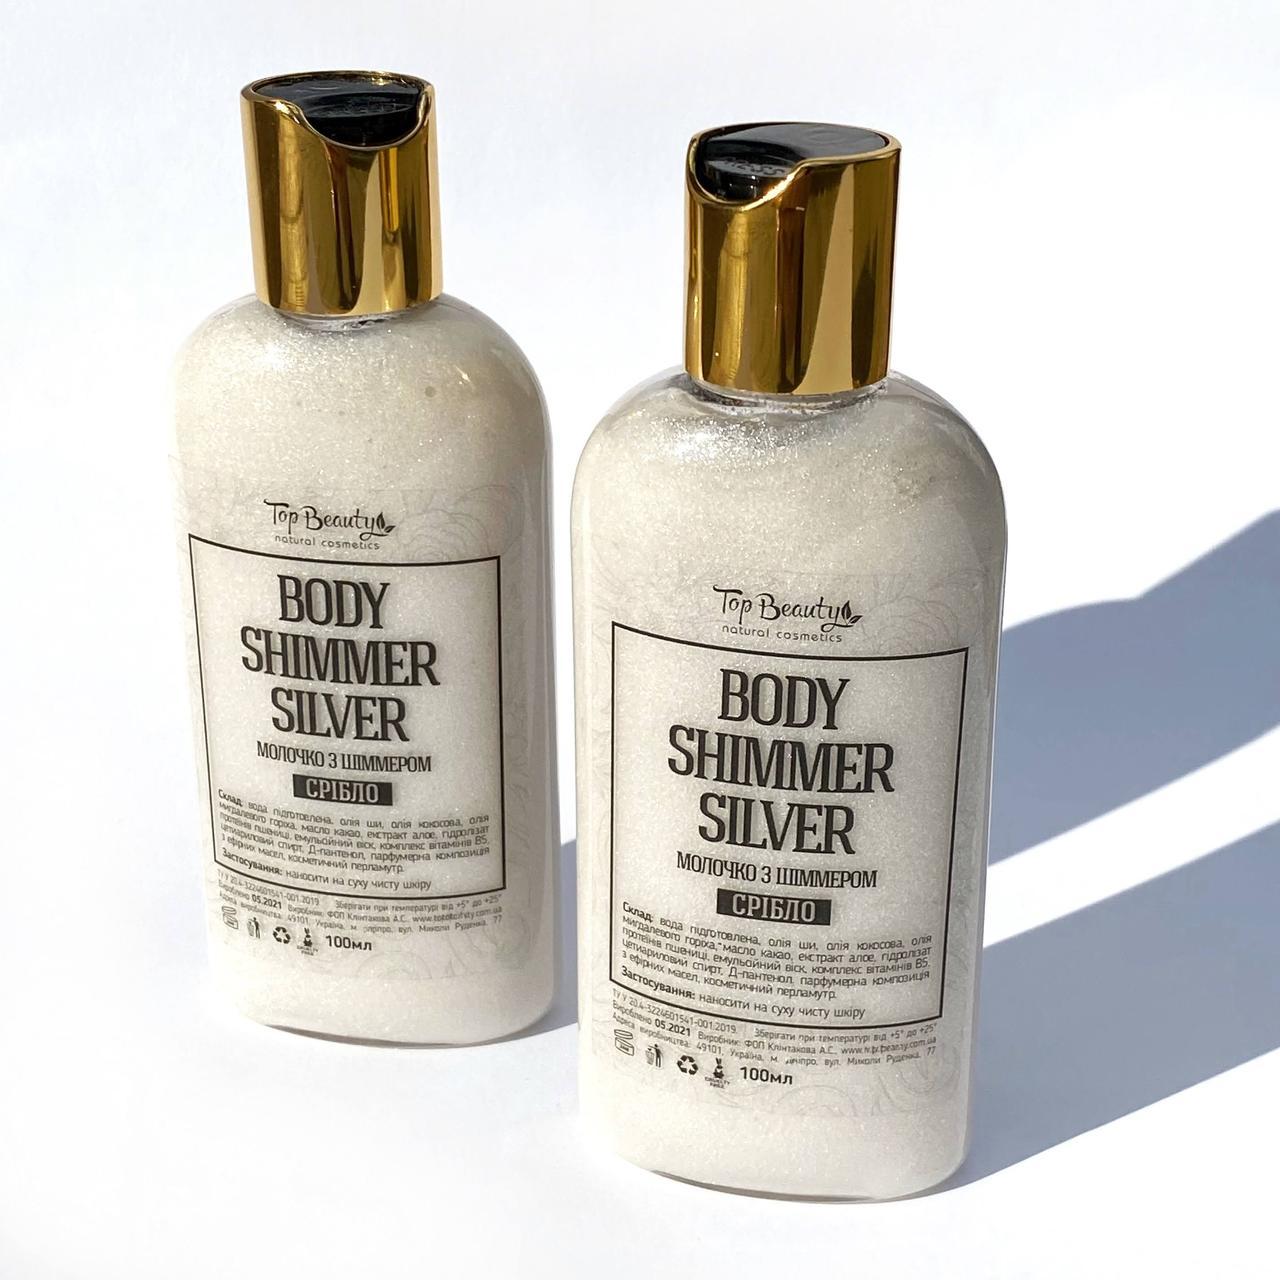 Молочко для тіла з шиммером top beauty body shimmer Silver 100 мл